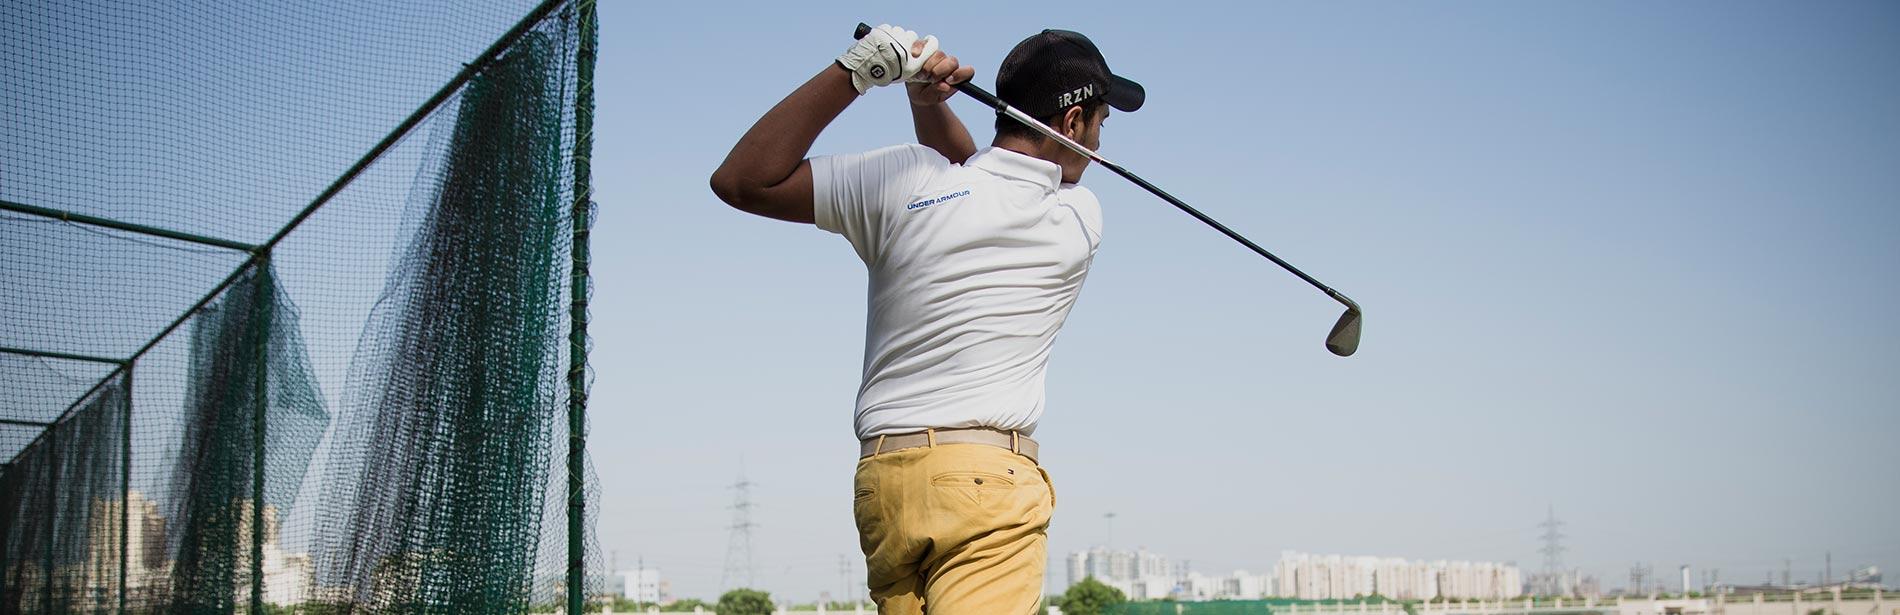 Golf:image